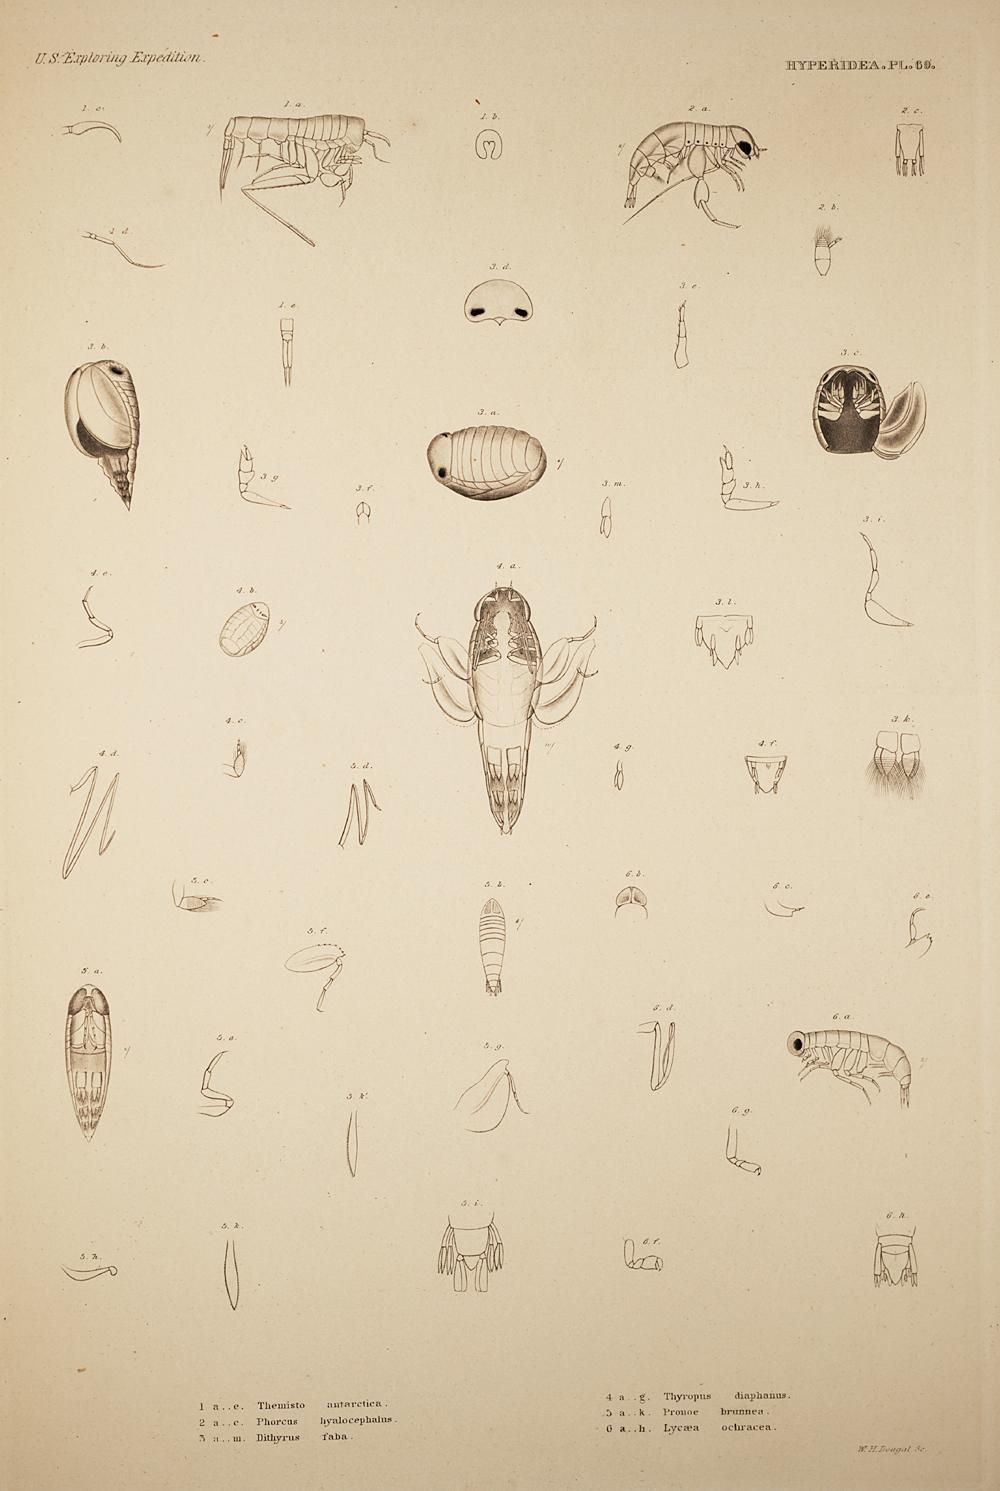 Hyperidea. Pl. 69,  Image number:SIL19-21-171b